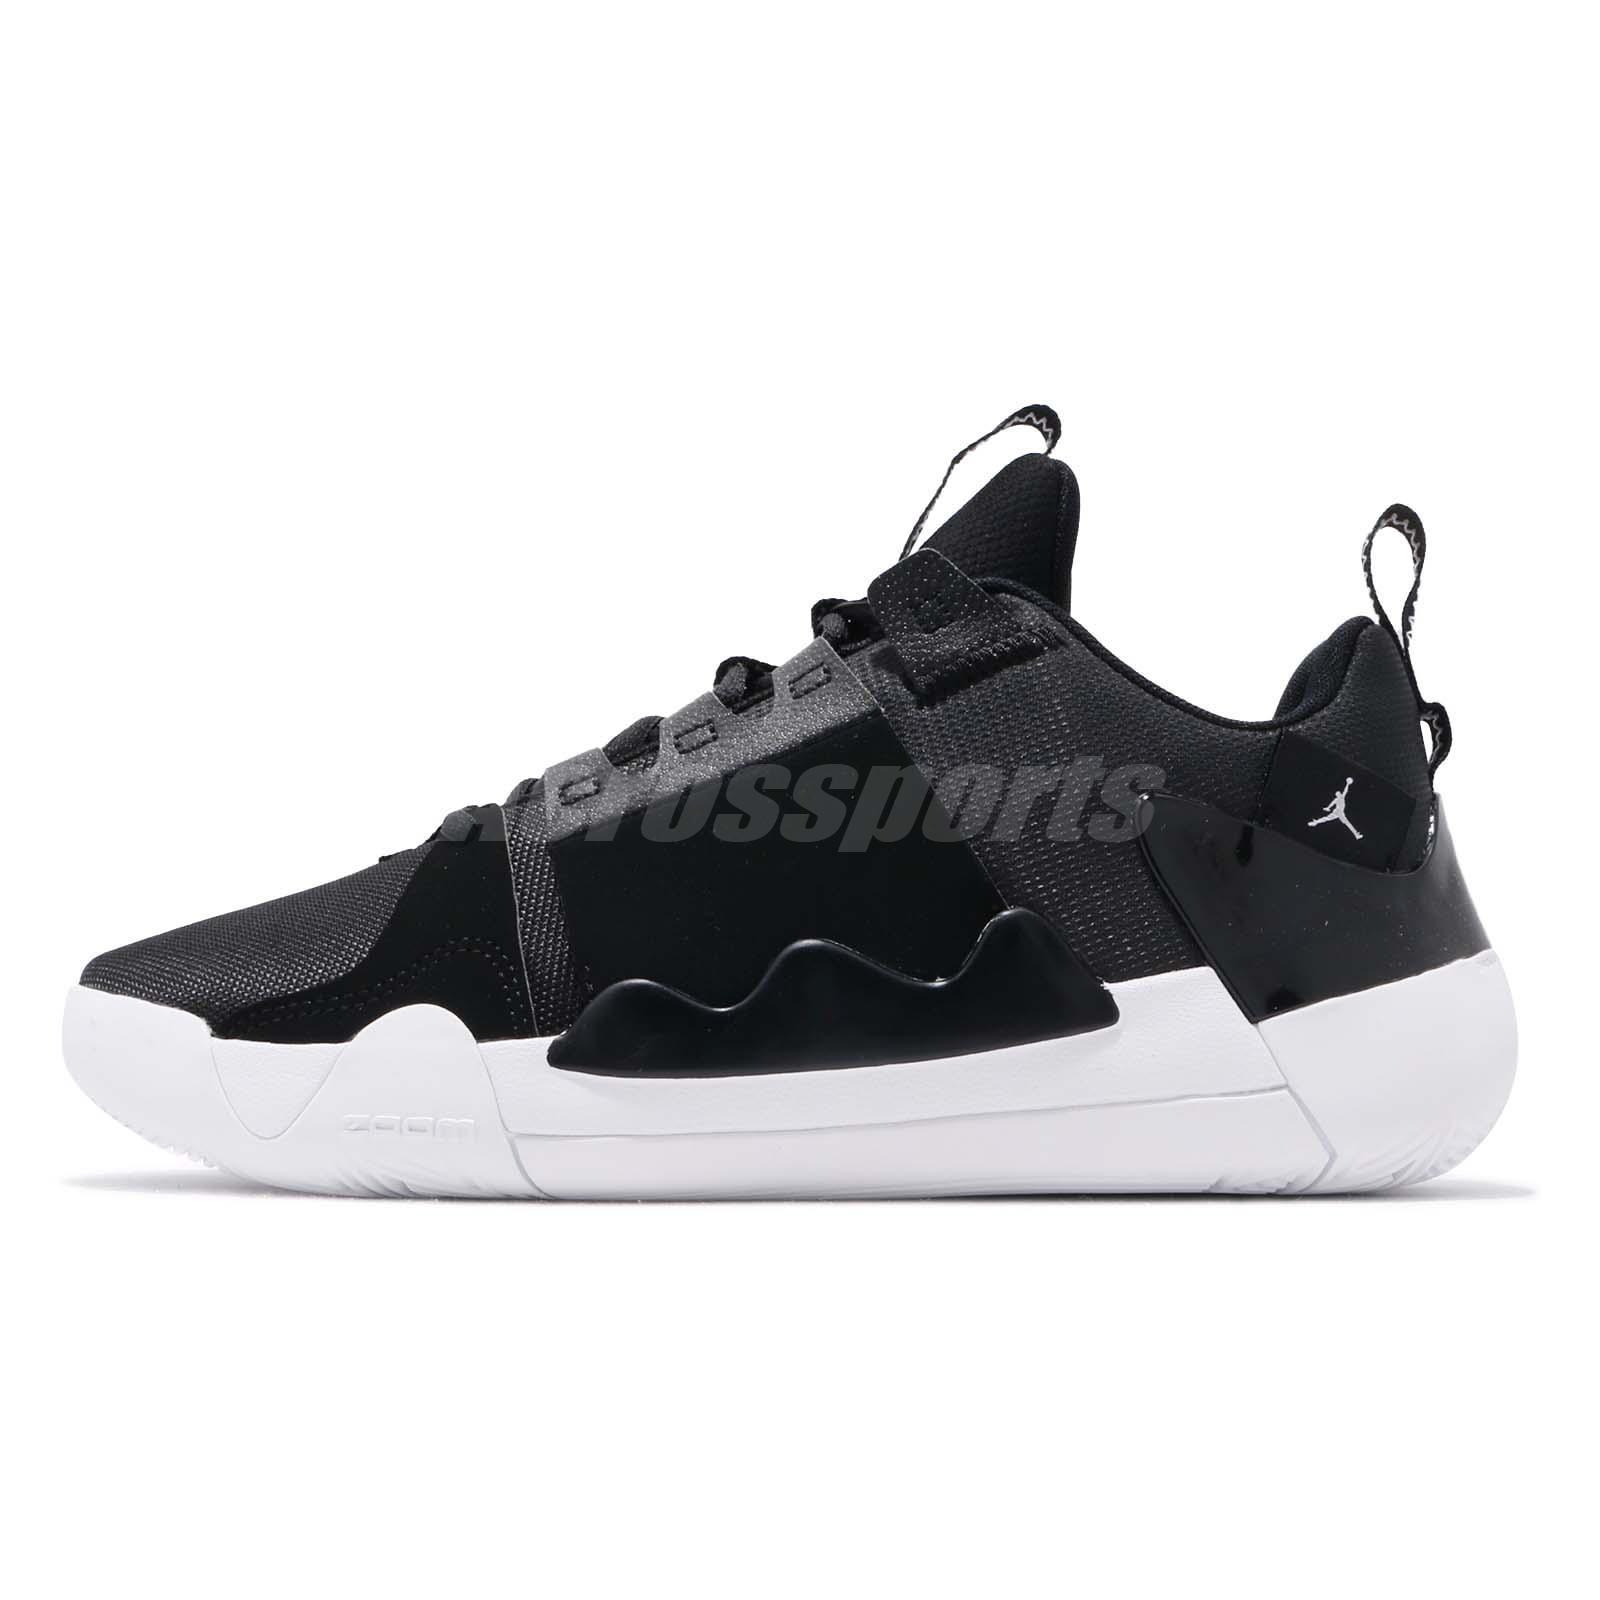 2d7590031e5 Nike Jordan Zoom Zero Gravity PF Black White Mens Basketball Shoes  AT4030-001